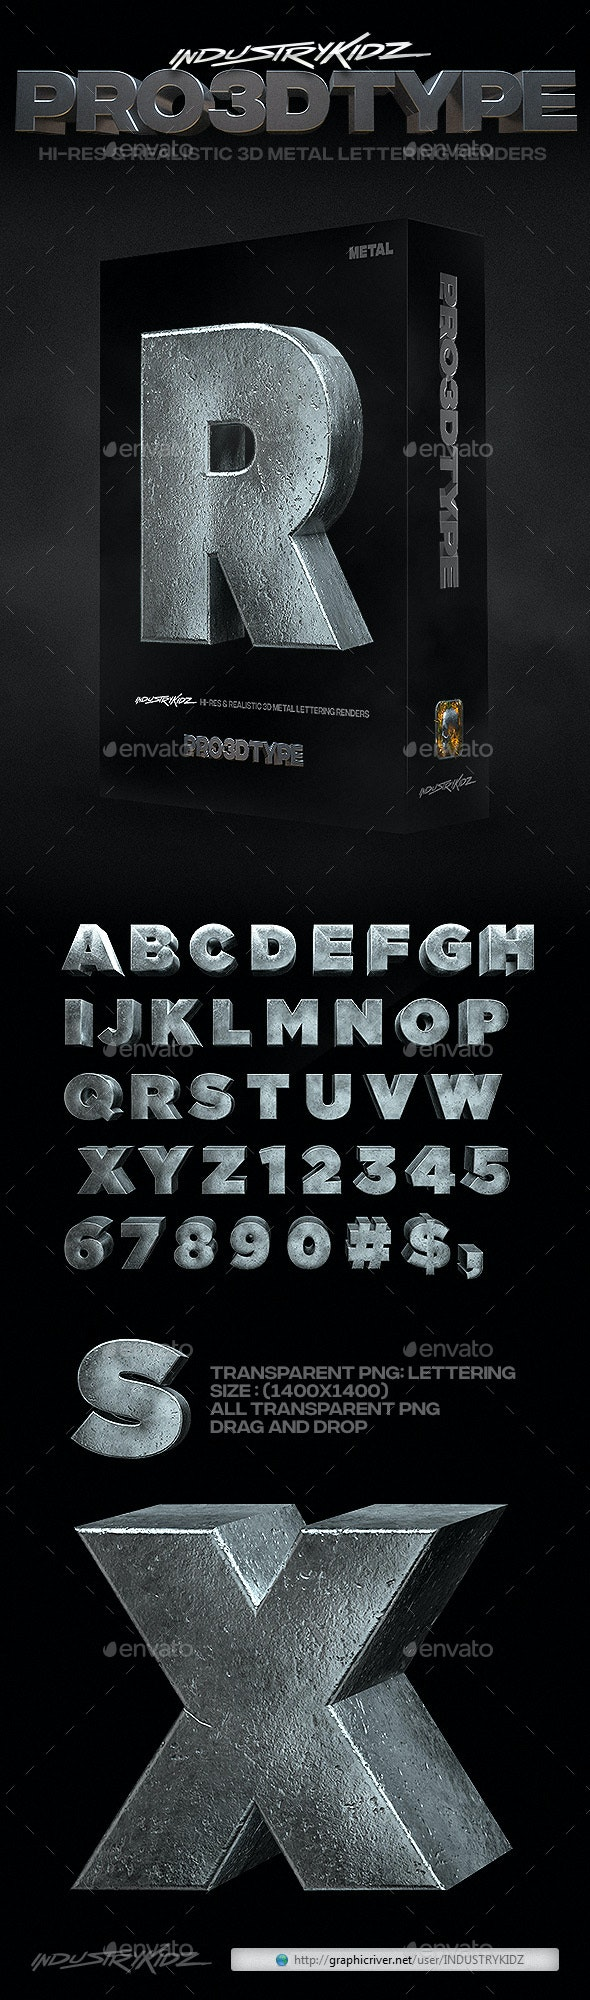 Metal 3D Letters - Text 3D Renders